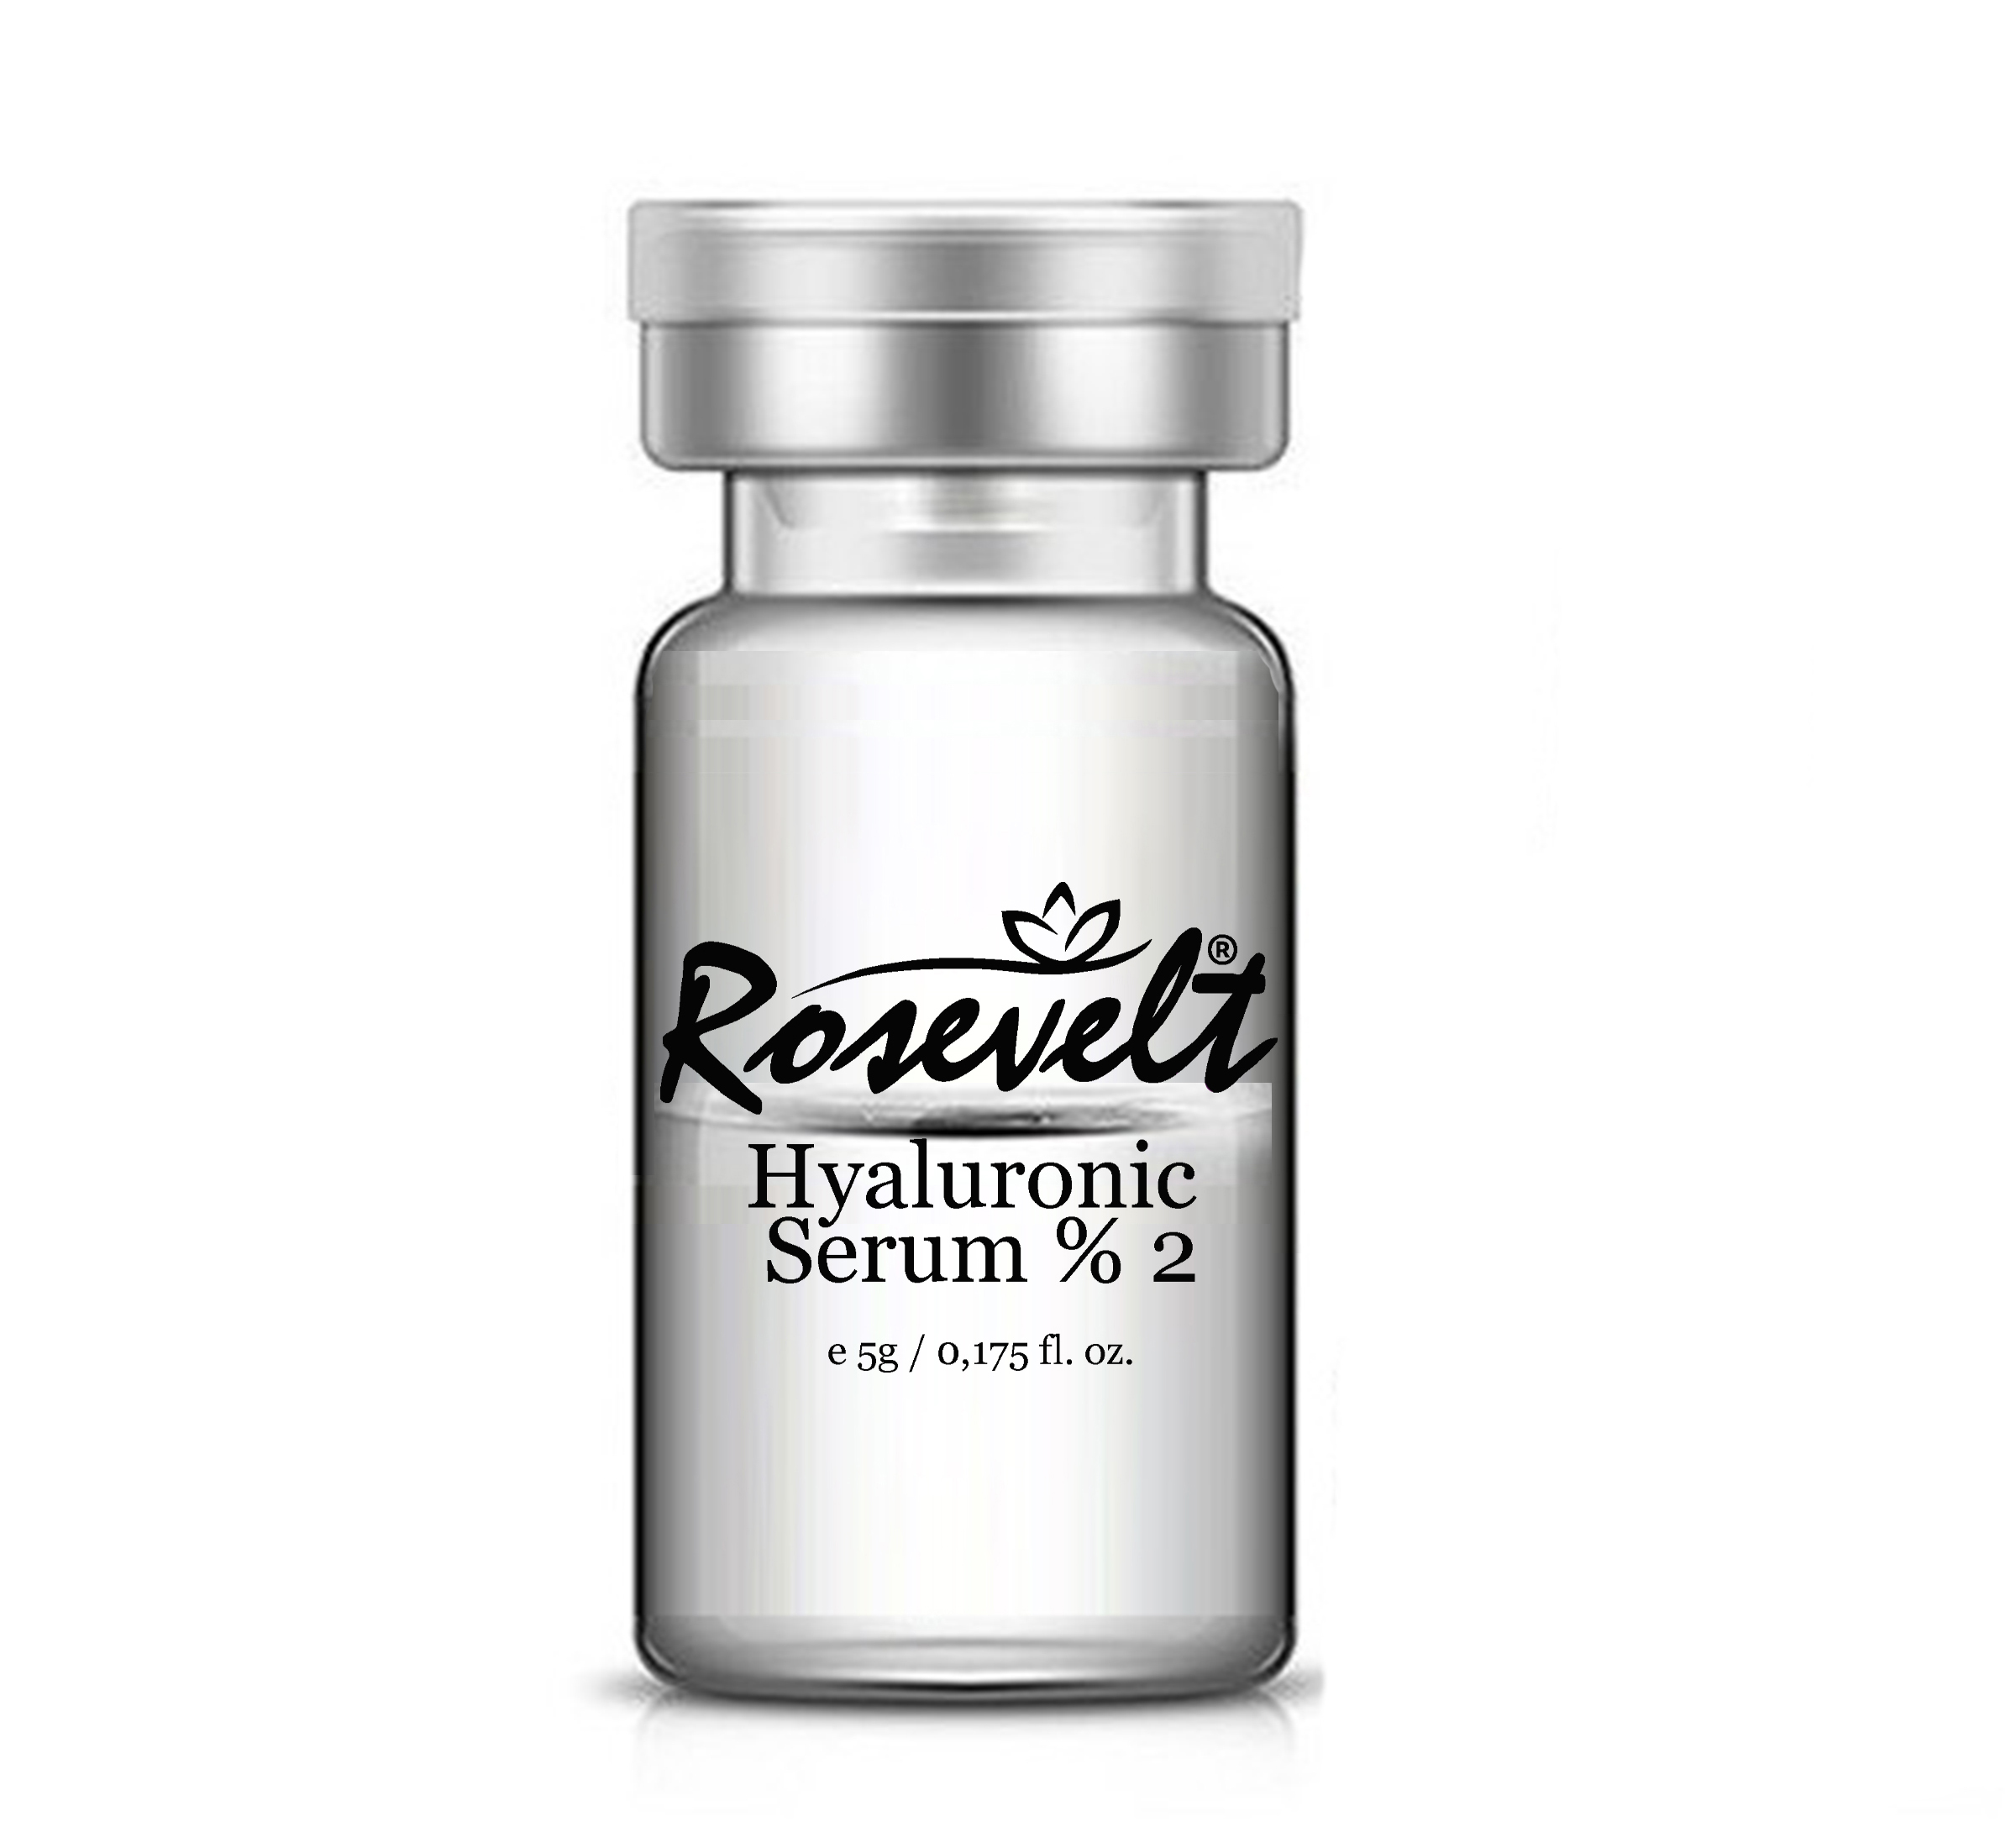 hyoluronic asid - ROSEVELT HYALURONİK ASİT %2 KUTU